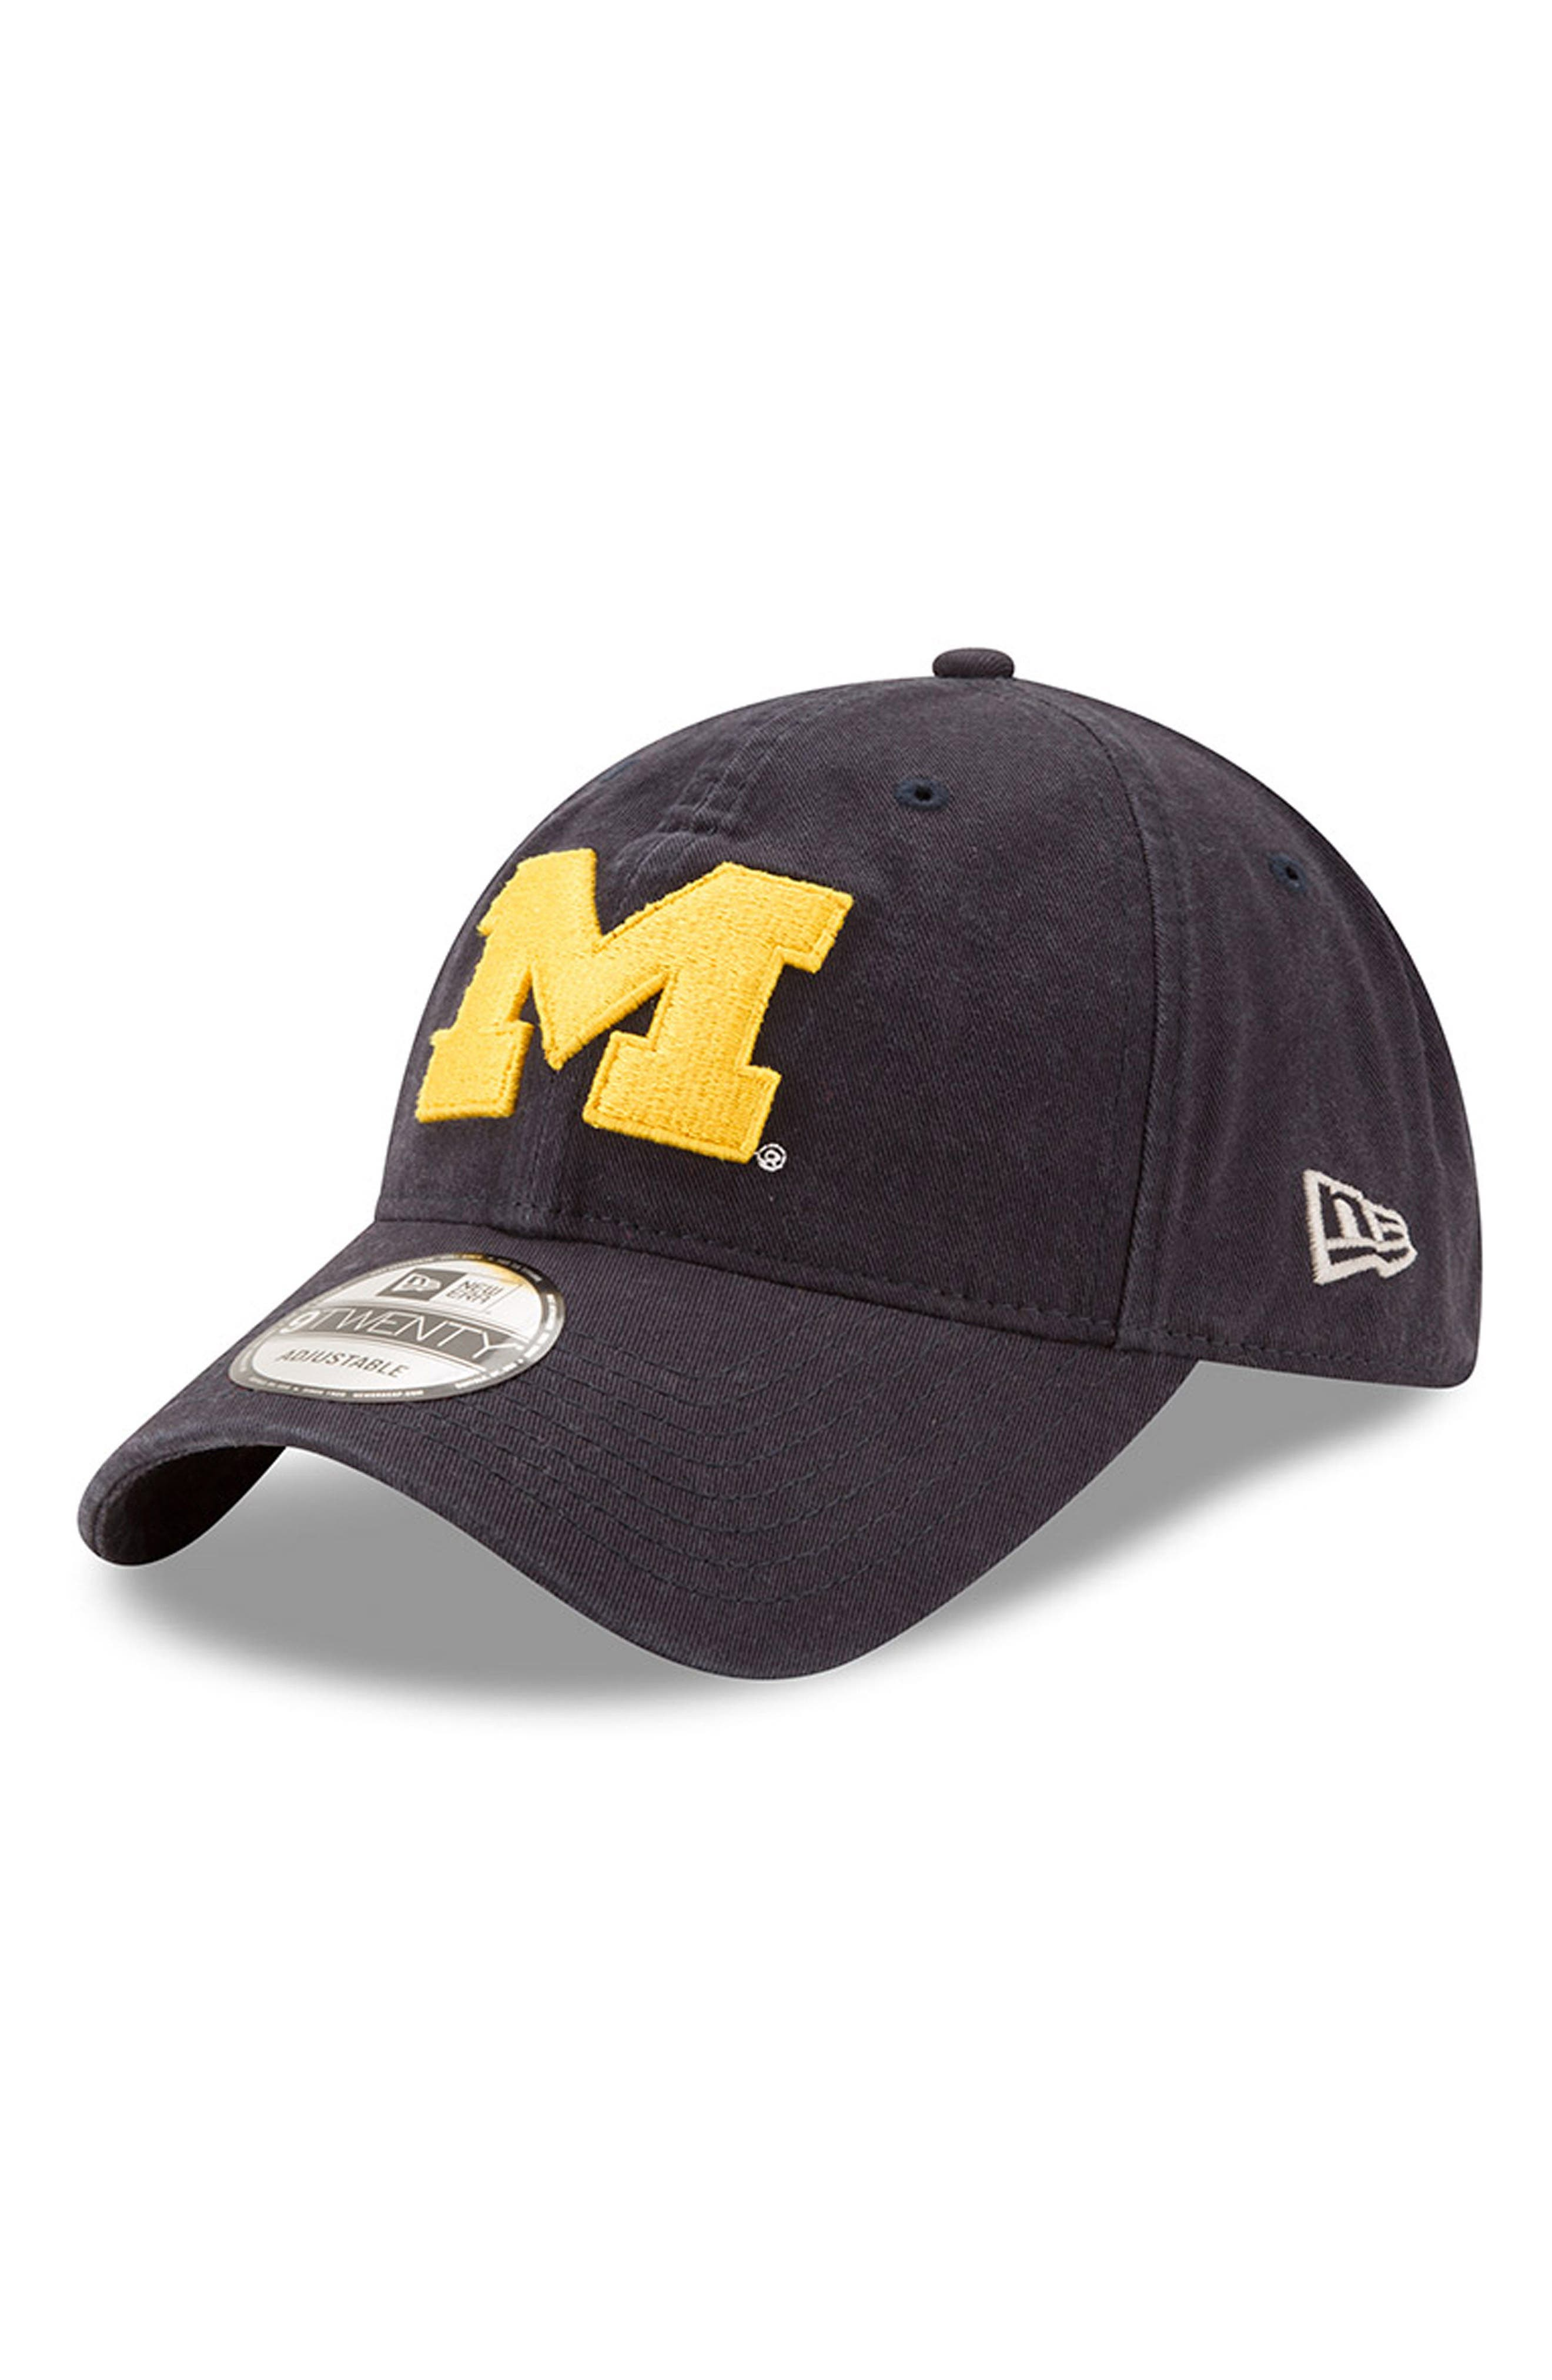 New Era Collegiate Core Classic - Michigan Wolverines Baseball Cap,                         Main,                         color, 410